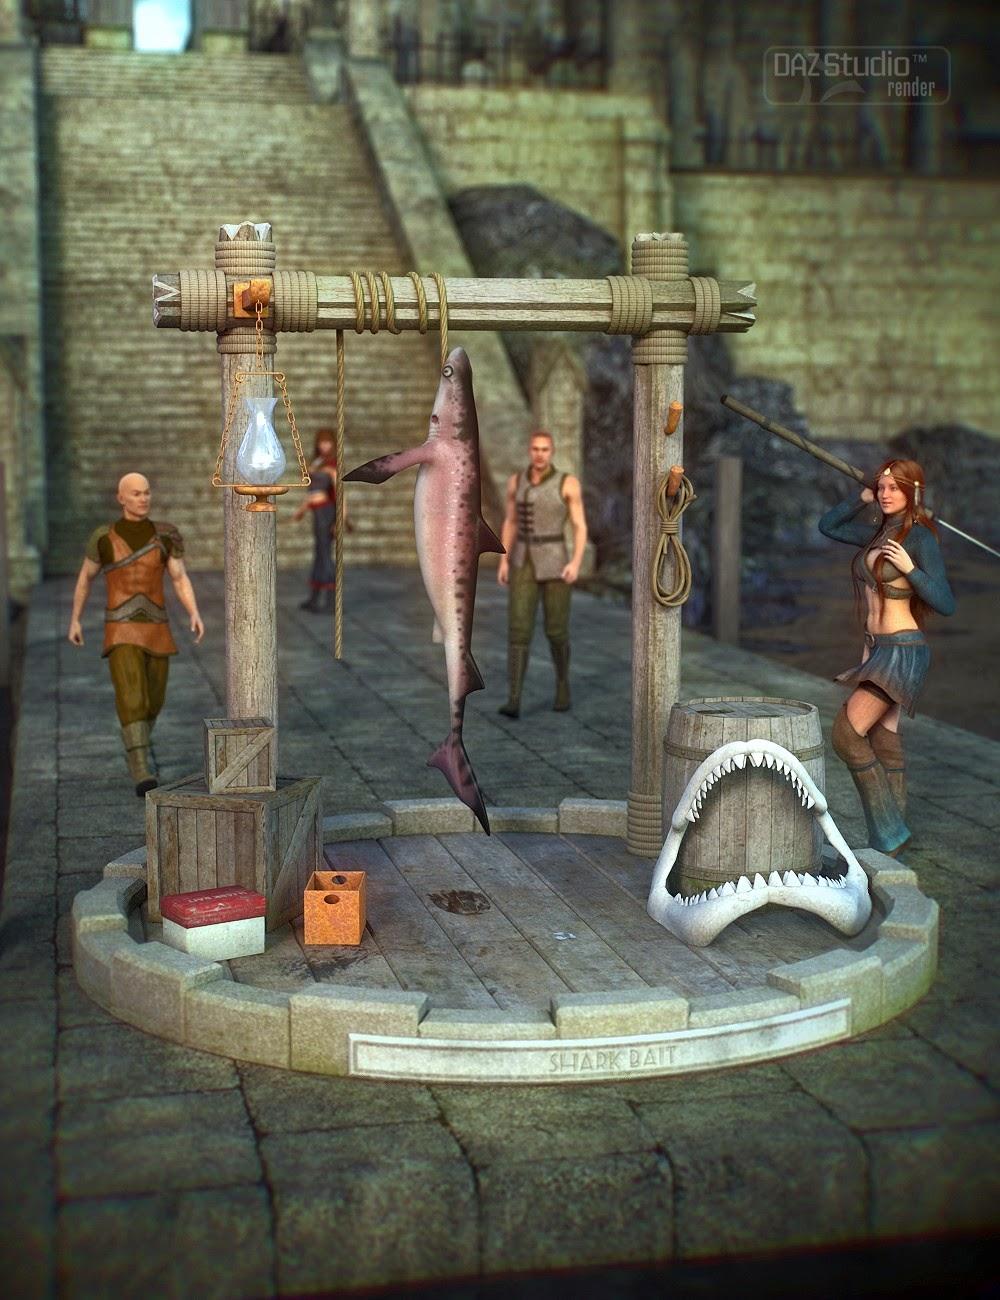 Shark Bait stand